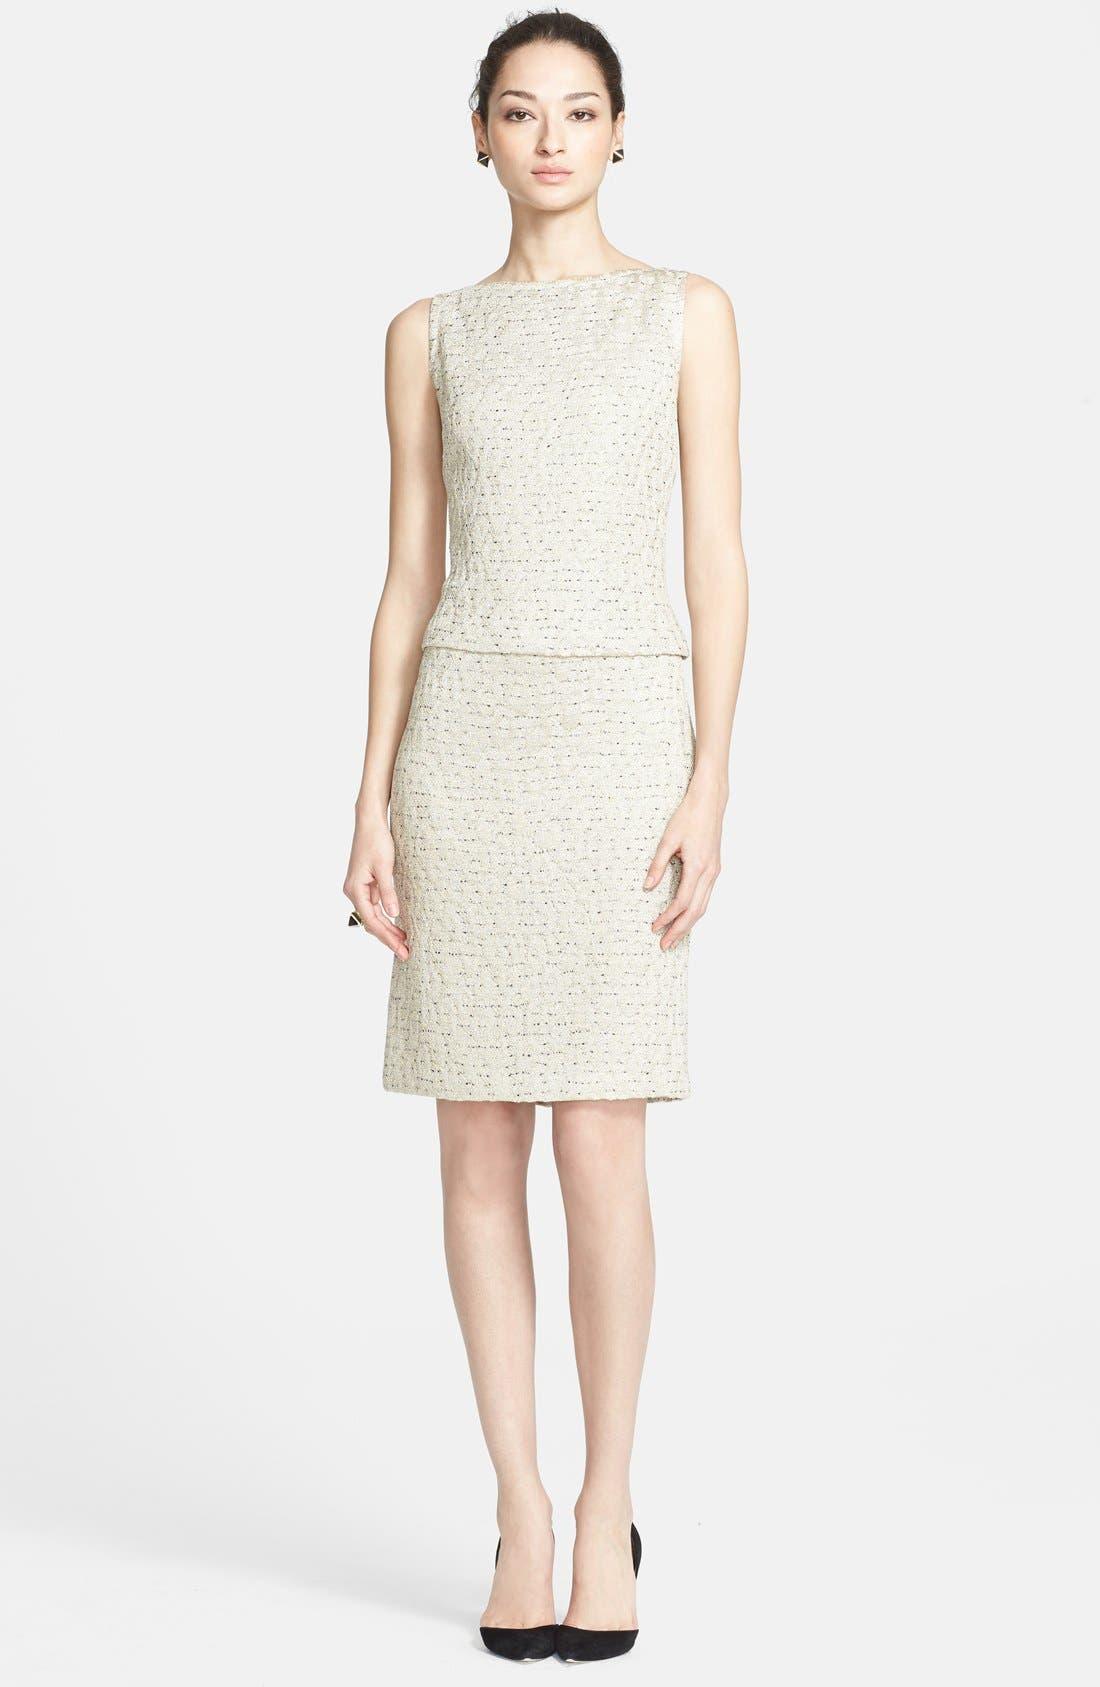 Main Image - St. John Collection Leopard Jacquard Knit Mock Two-Piece Dress